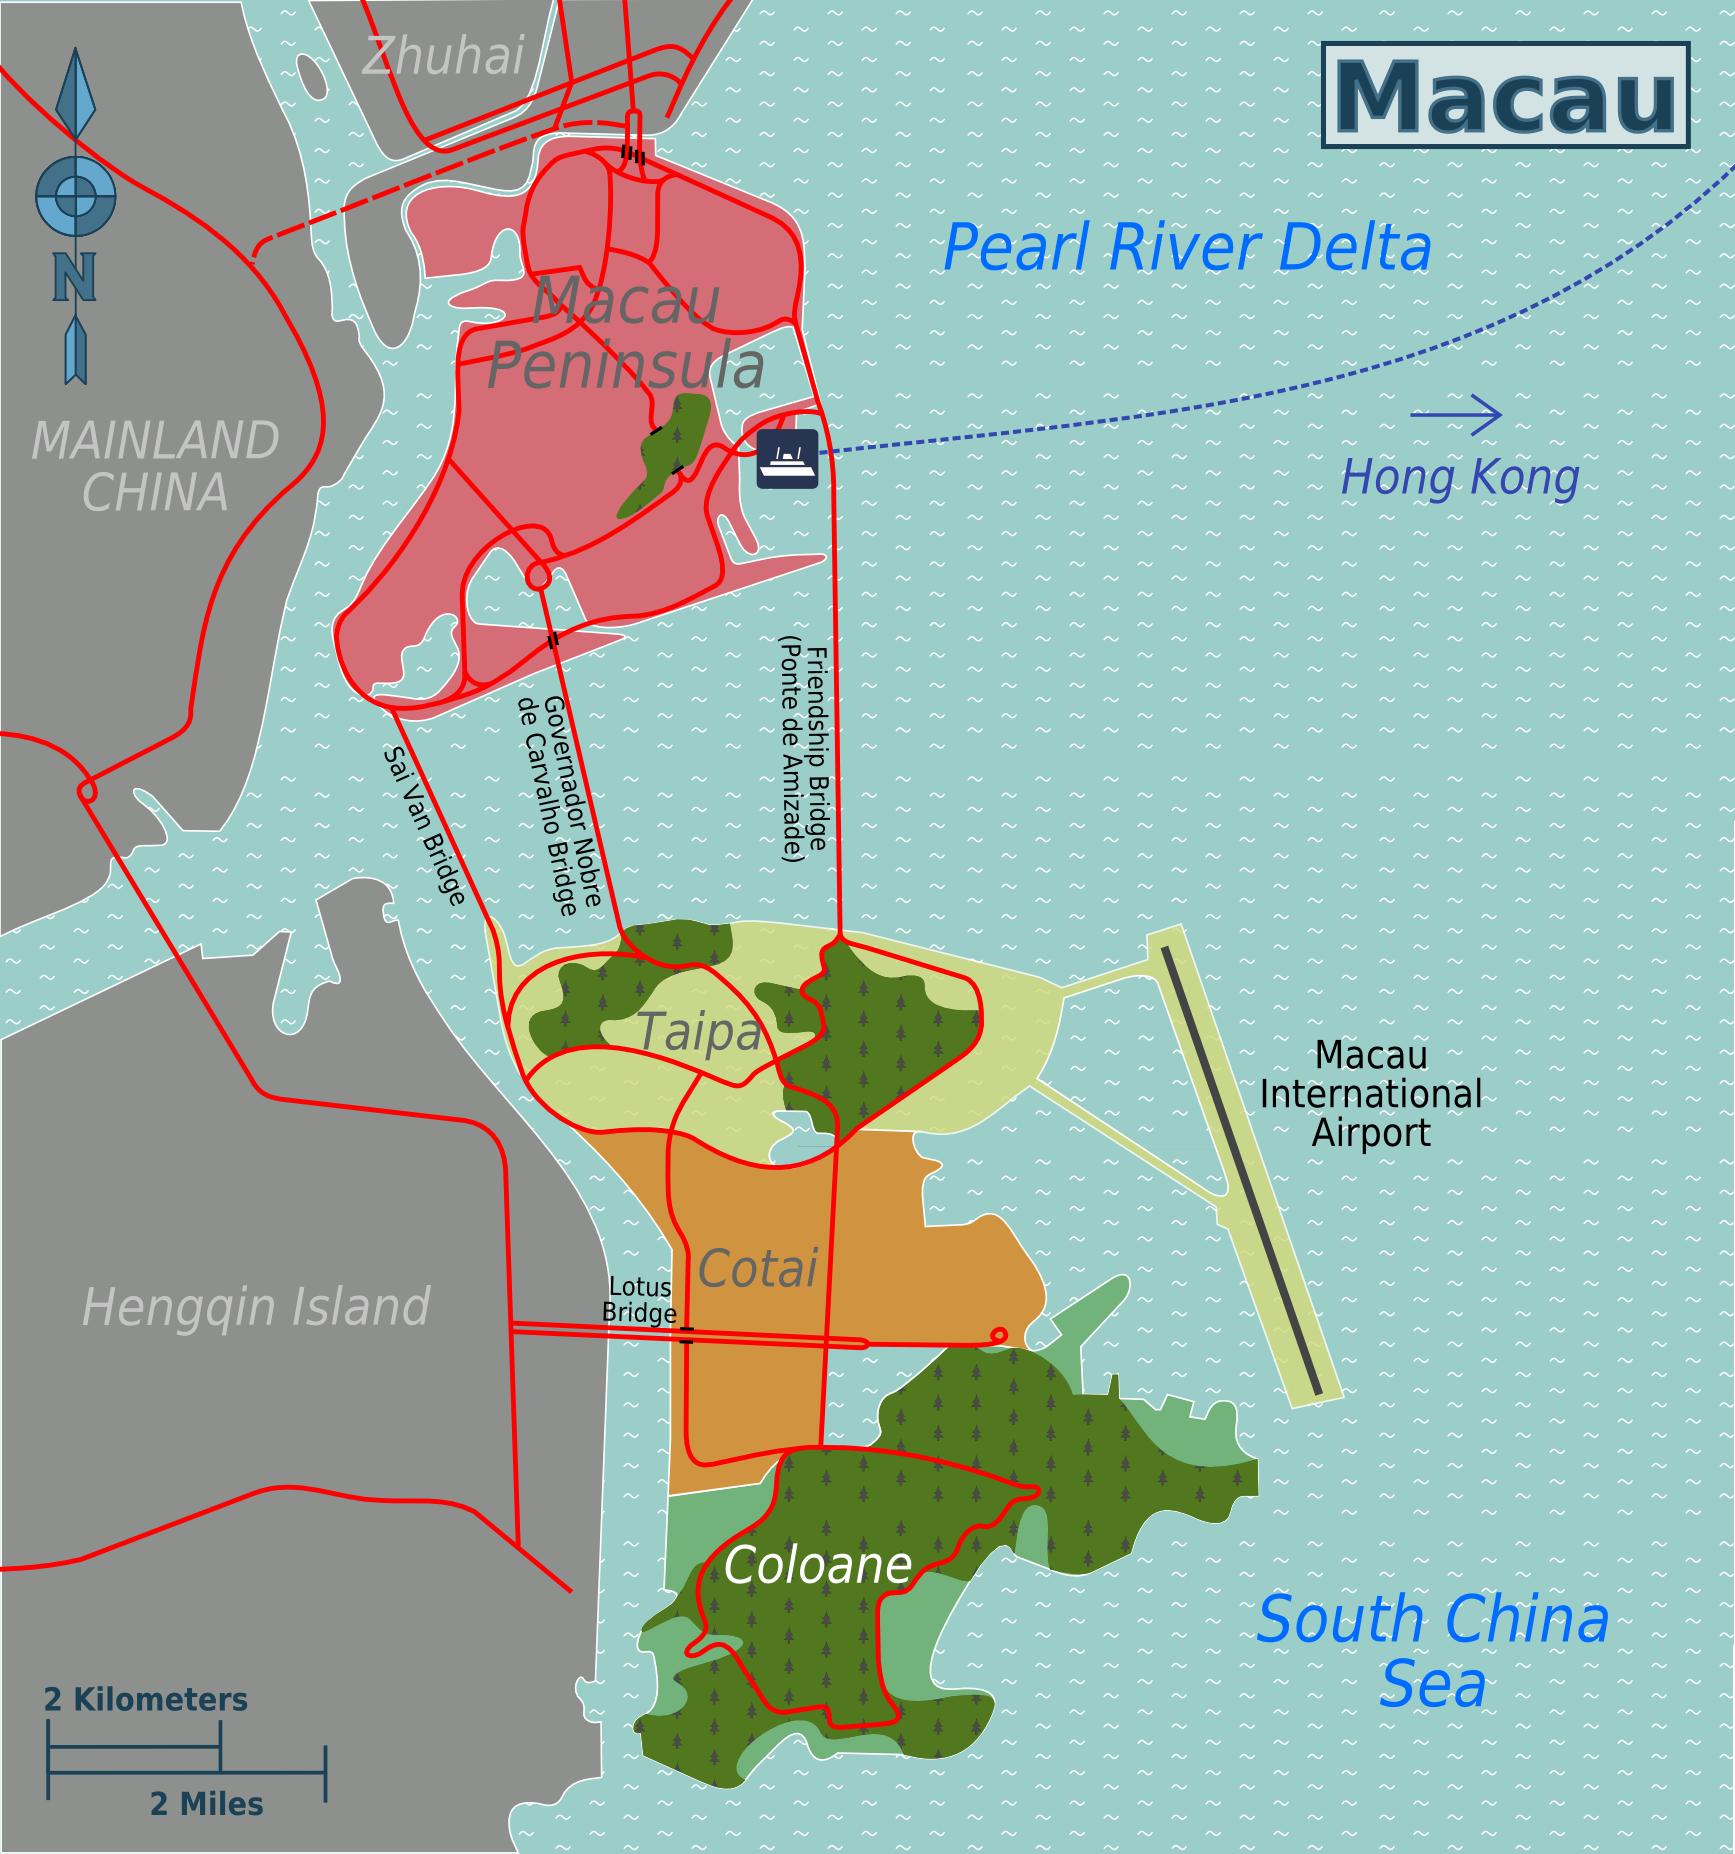 Pin by CARLTON NOBLE on MACAU HONG KONG Pinterest Macau